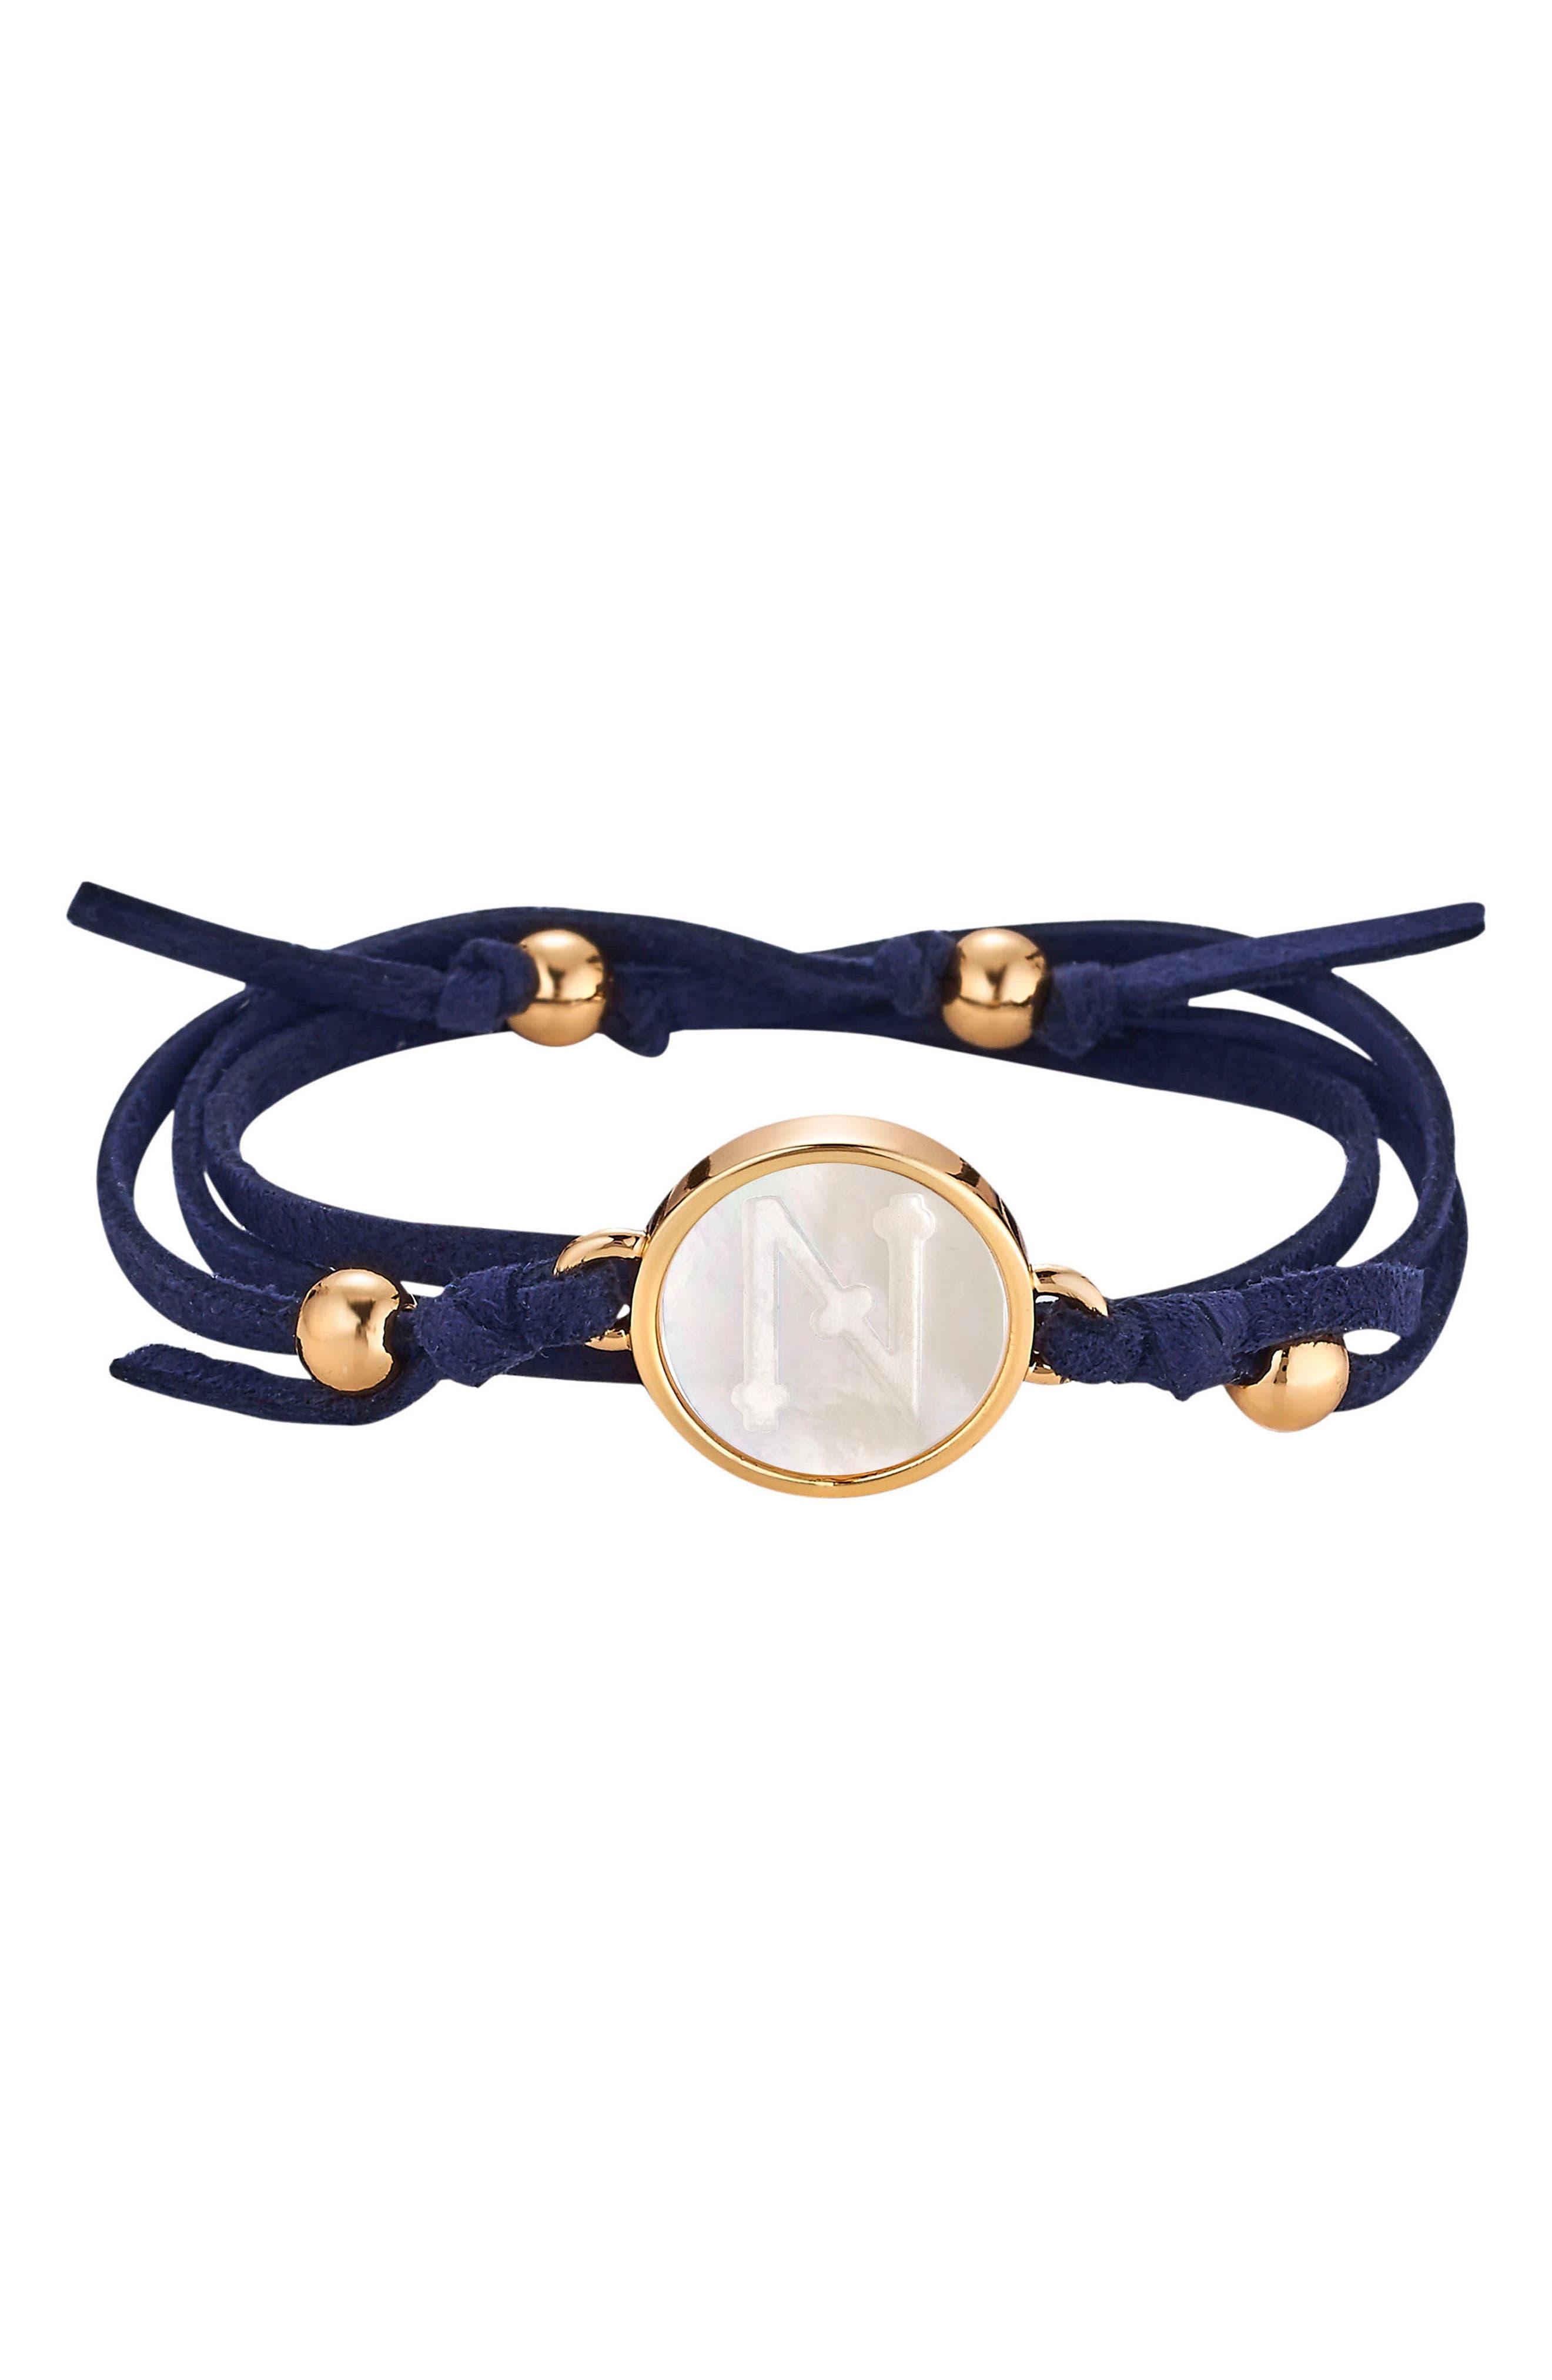 Alternate Image 1 Selected - ASHA Initial Suede Wrap Bracelet